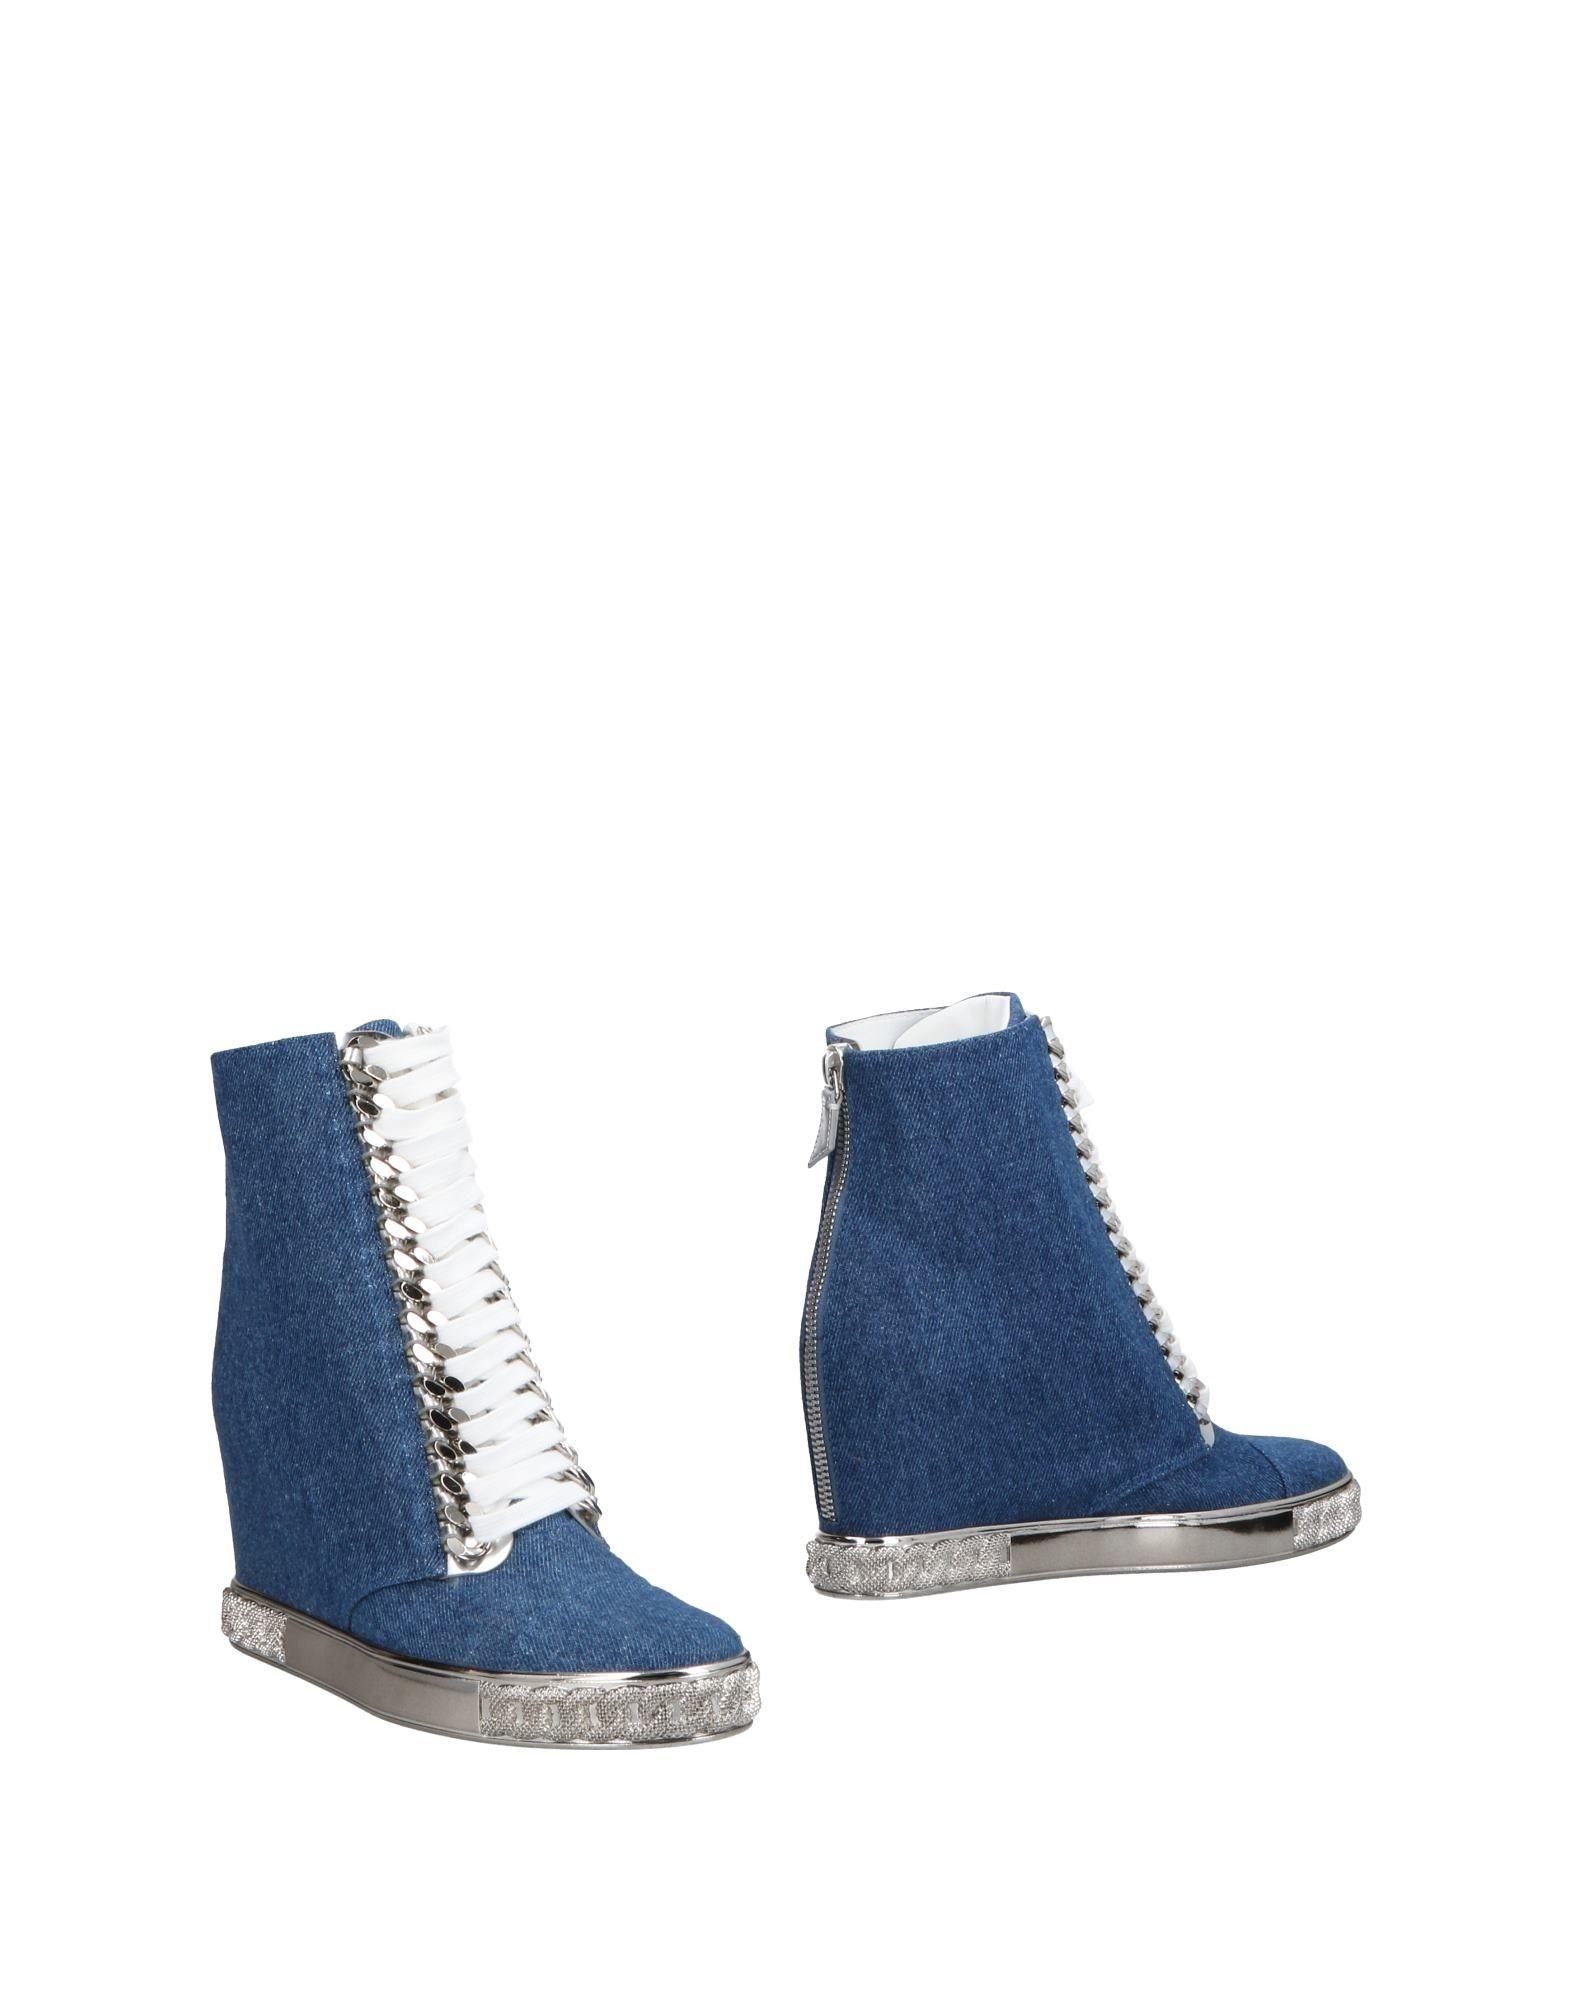 Casadei Stiefelette Damen Schuhe  11507915DHGünstige gut aussehende Schuhe Damen 0a84e0